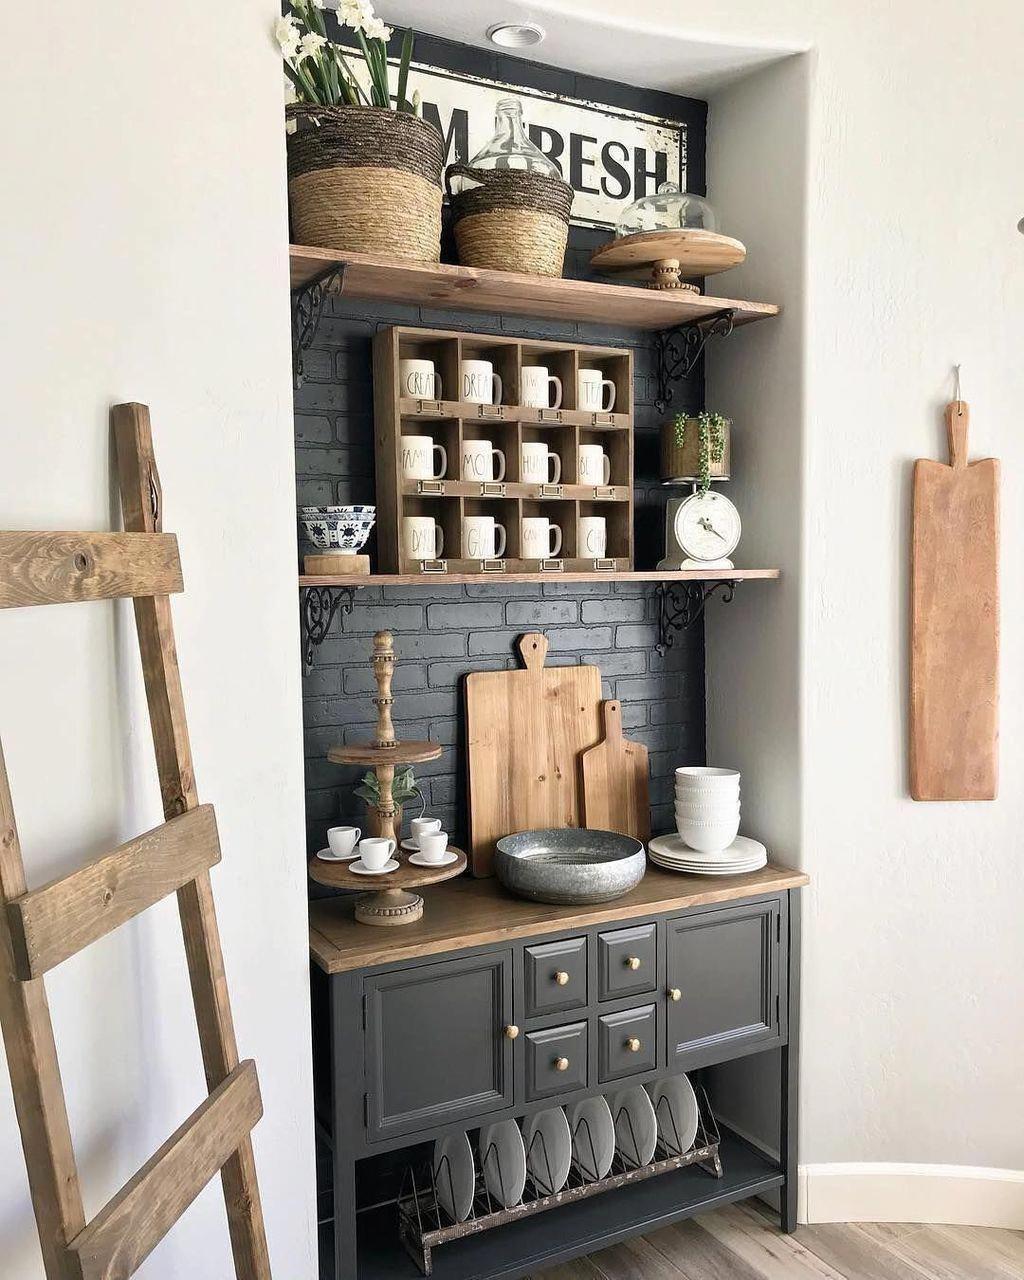 38 Amazing Antique Farmhouse Decoration Ideas For Your Home Decor Farmhousehomedecoration Home Decor Kitchen Decor Country House Decor